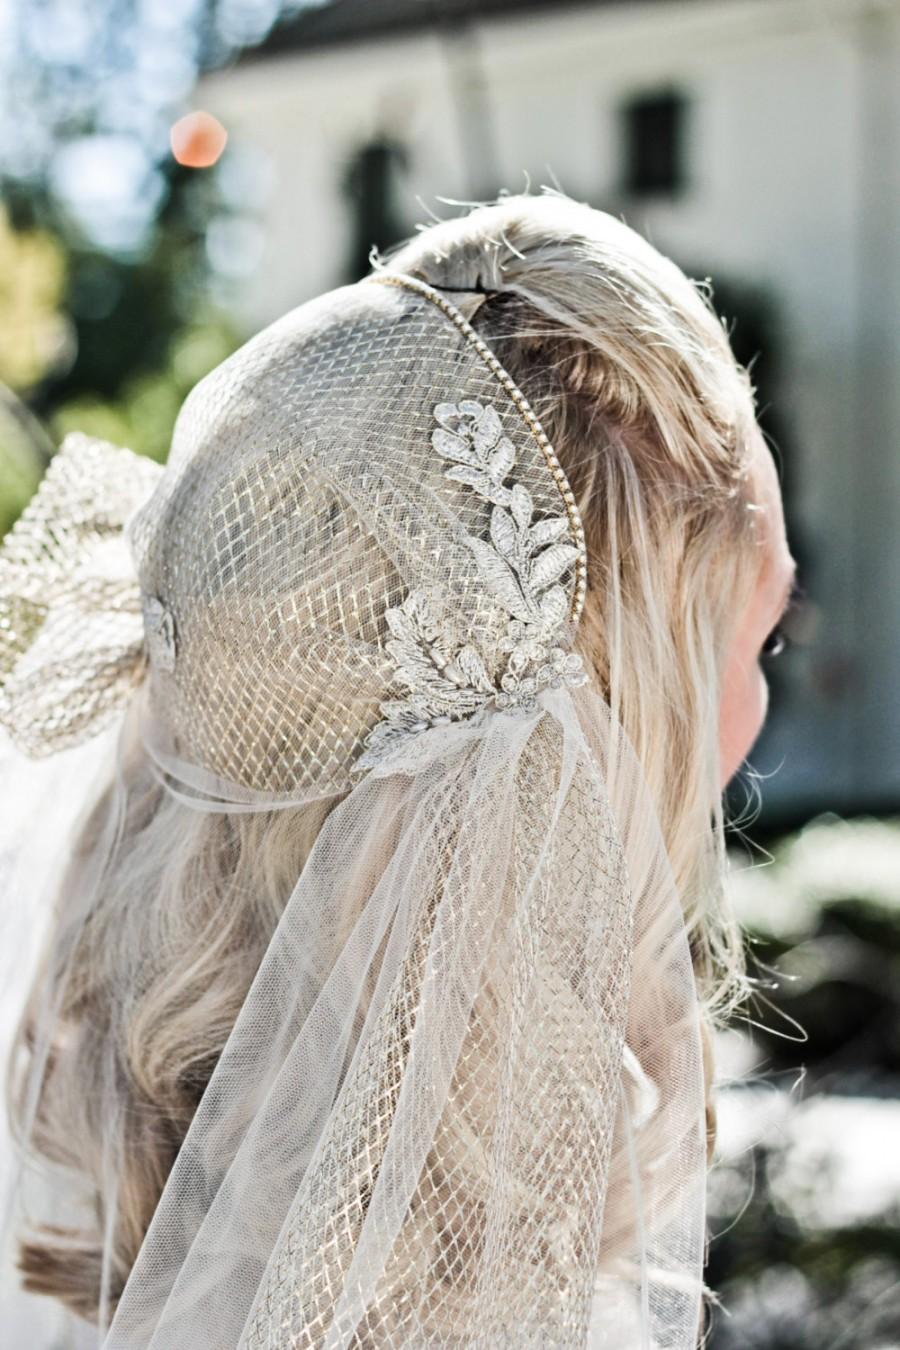 Hochzeit - Juliet Cap Wedding Veil, Alencon Lace, Rhinestone Bridal Cap, Pearls, Cathedral, Chapel, Waltz, Blusher, Ivory, Champagne, Style: Lola Gold